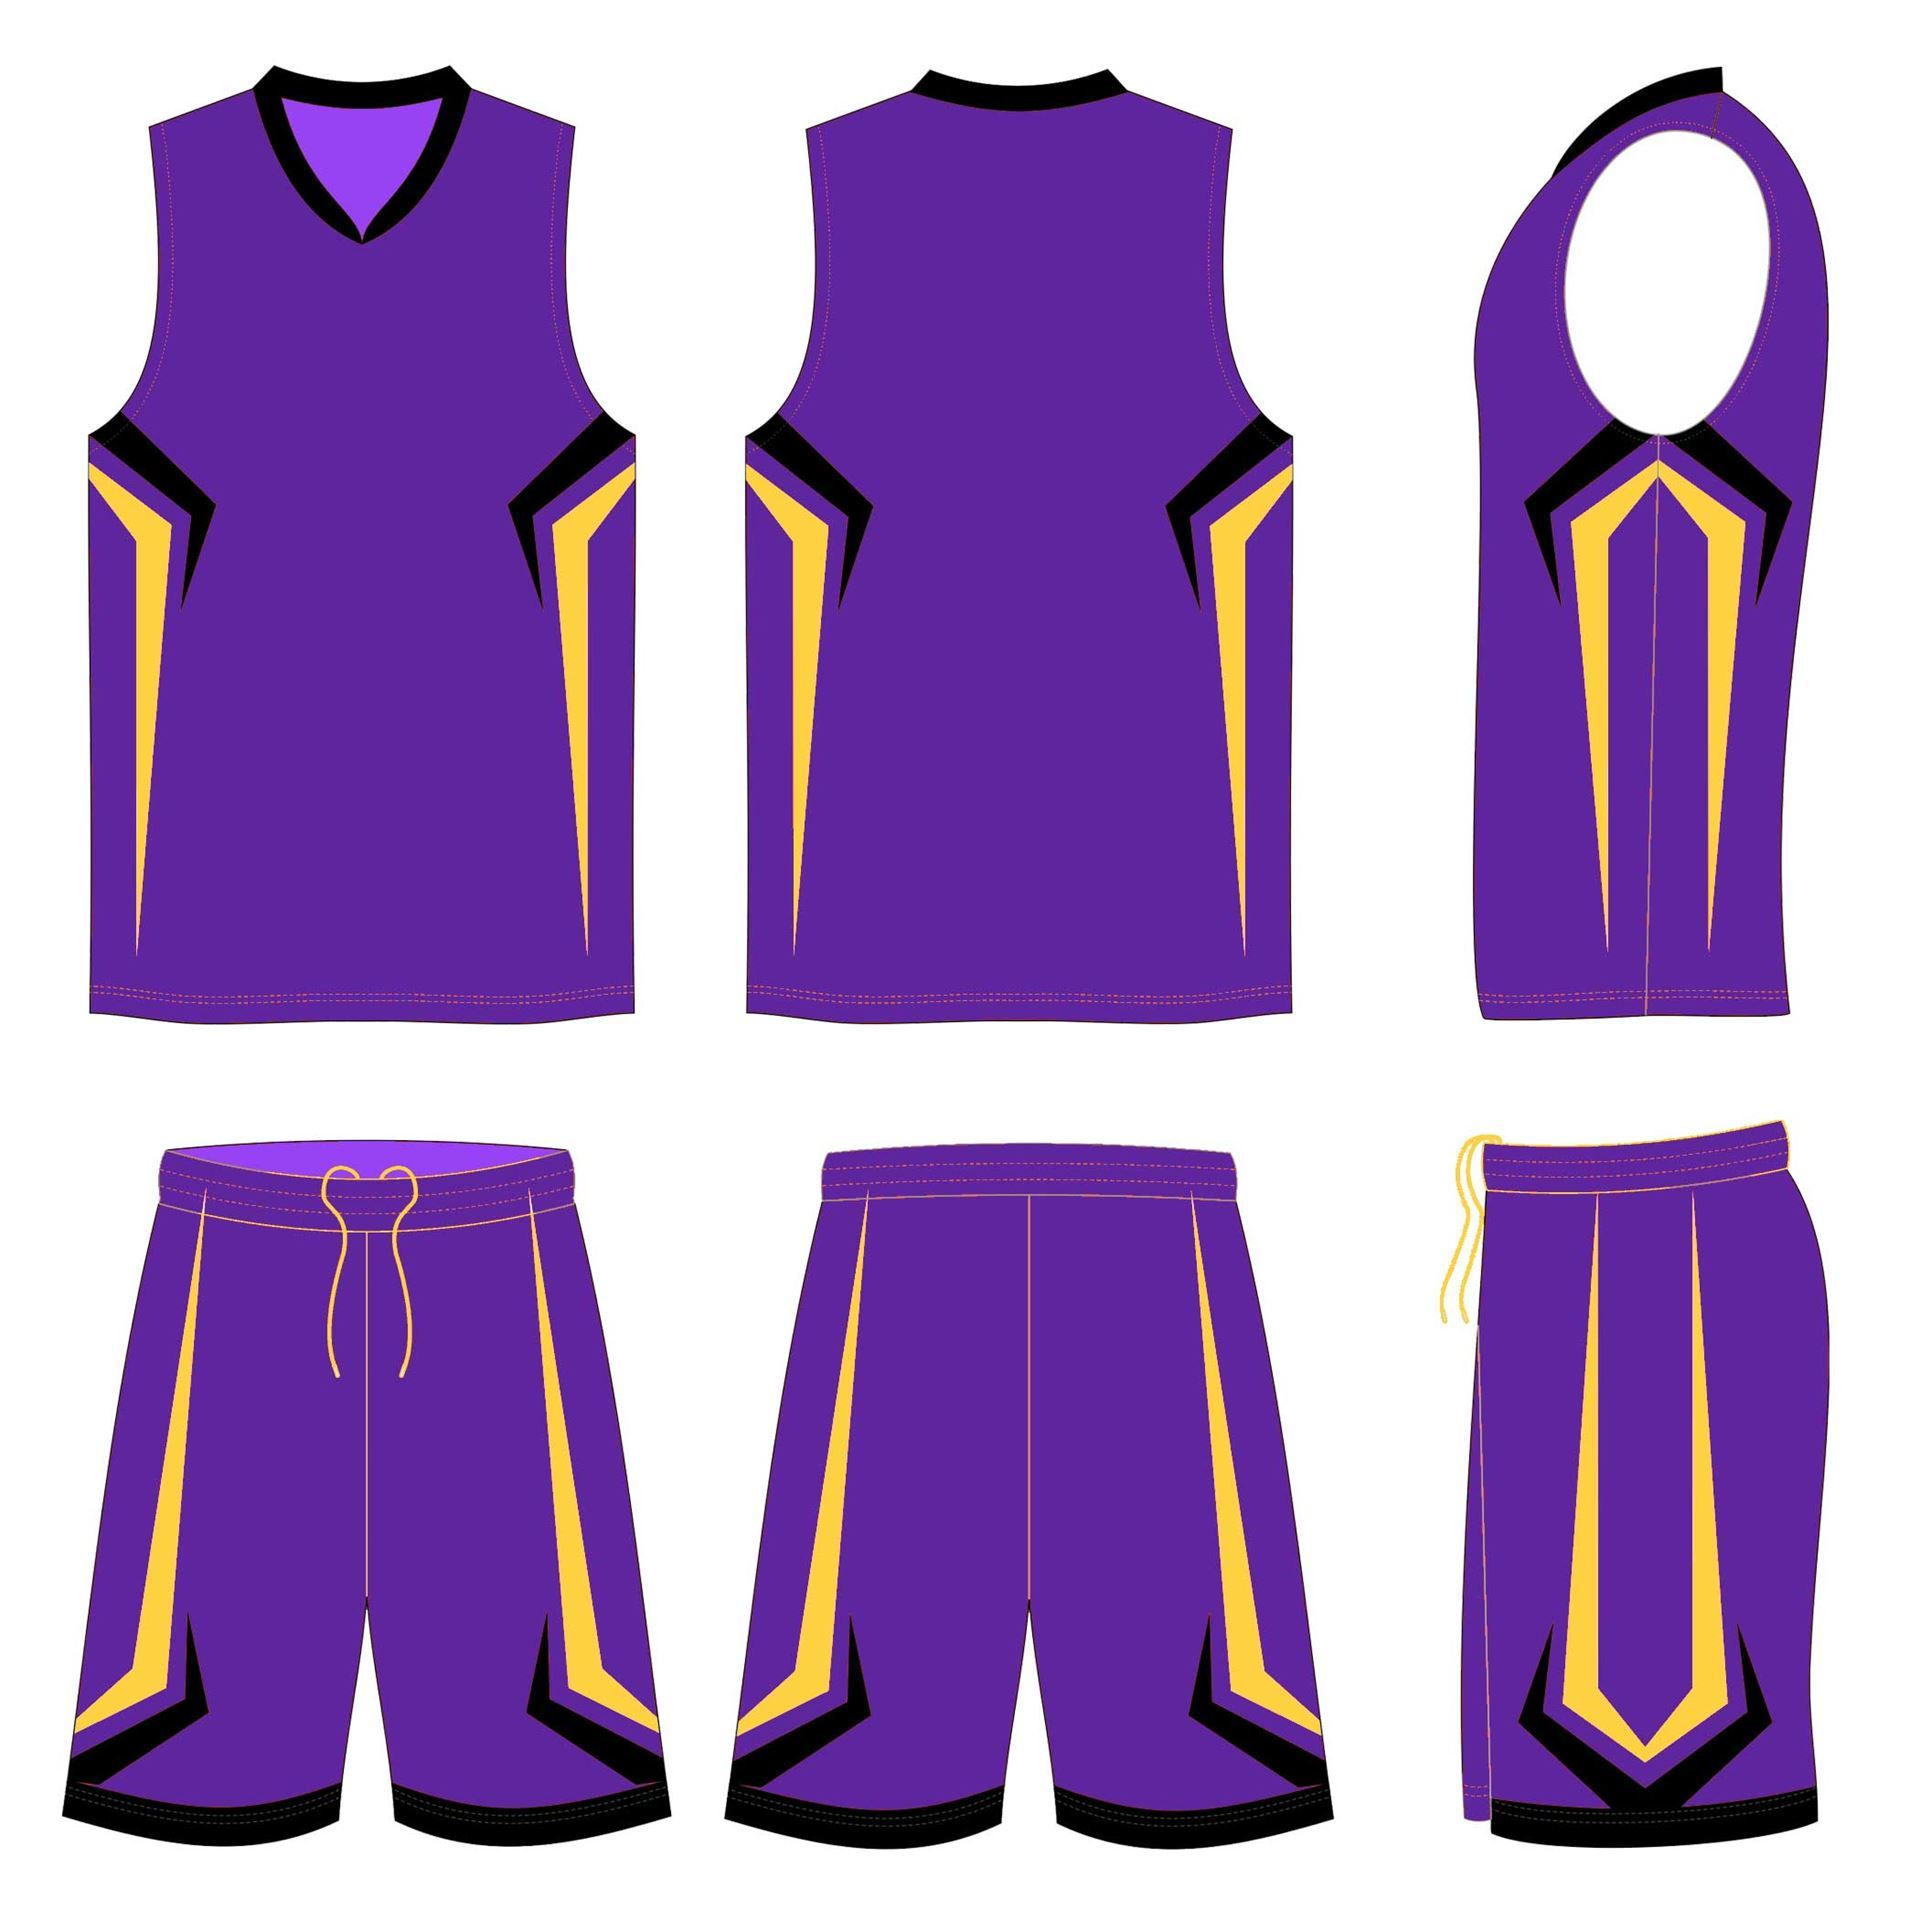 3bf8b0fc499 Ballers Beast - Basketball Kit Style 574 Custom